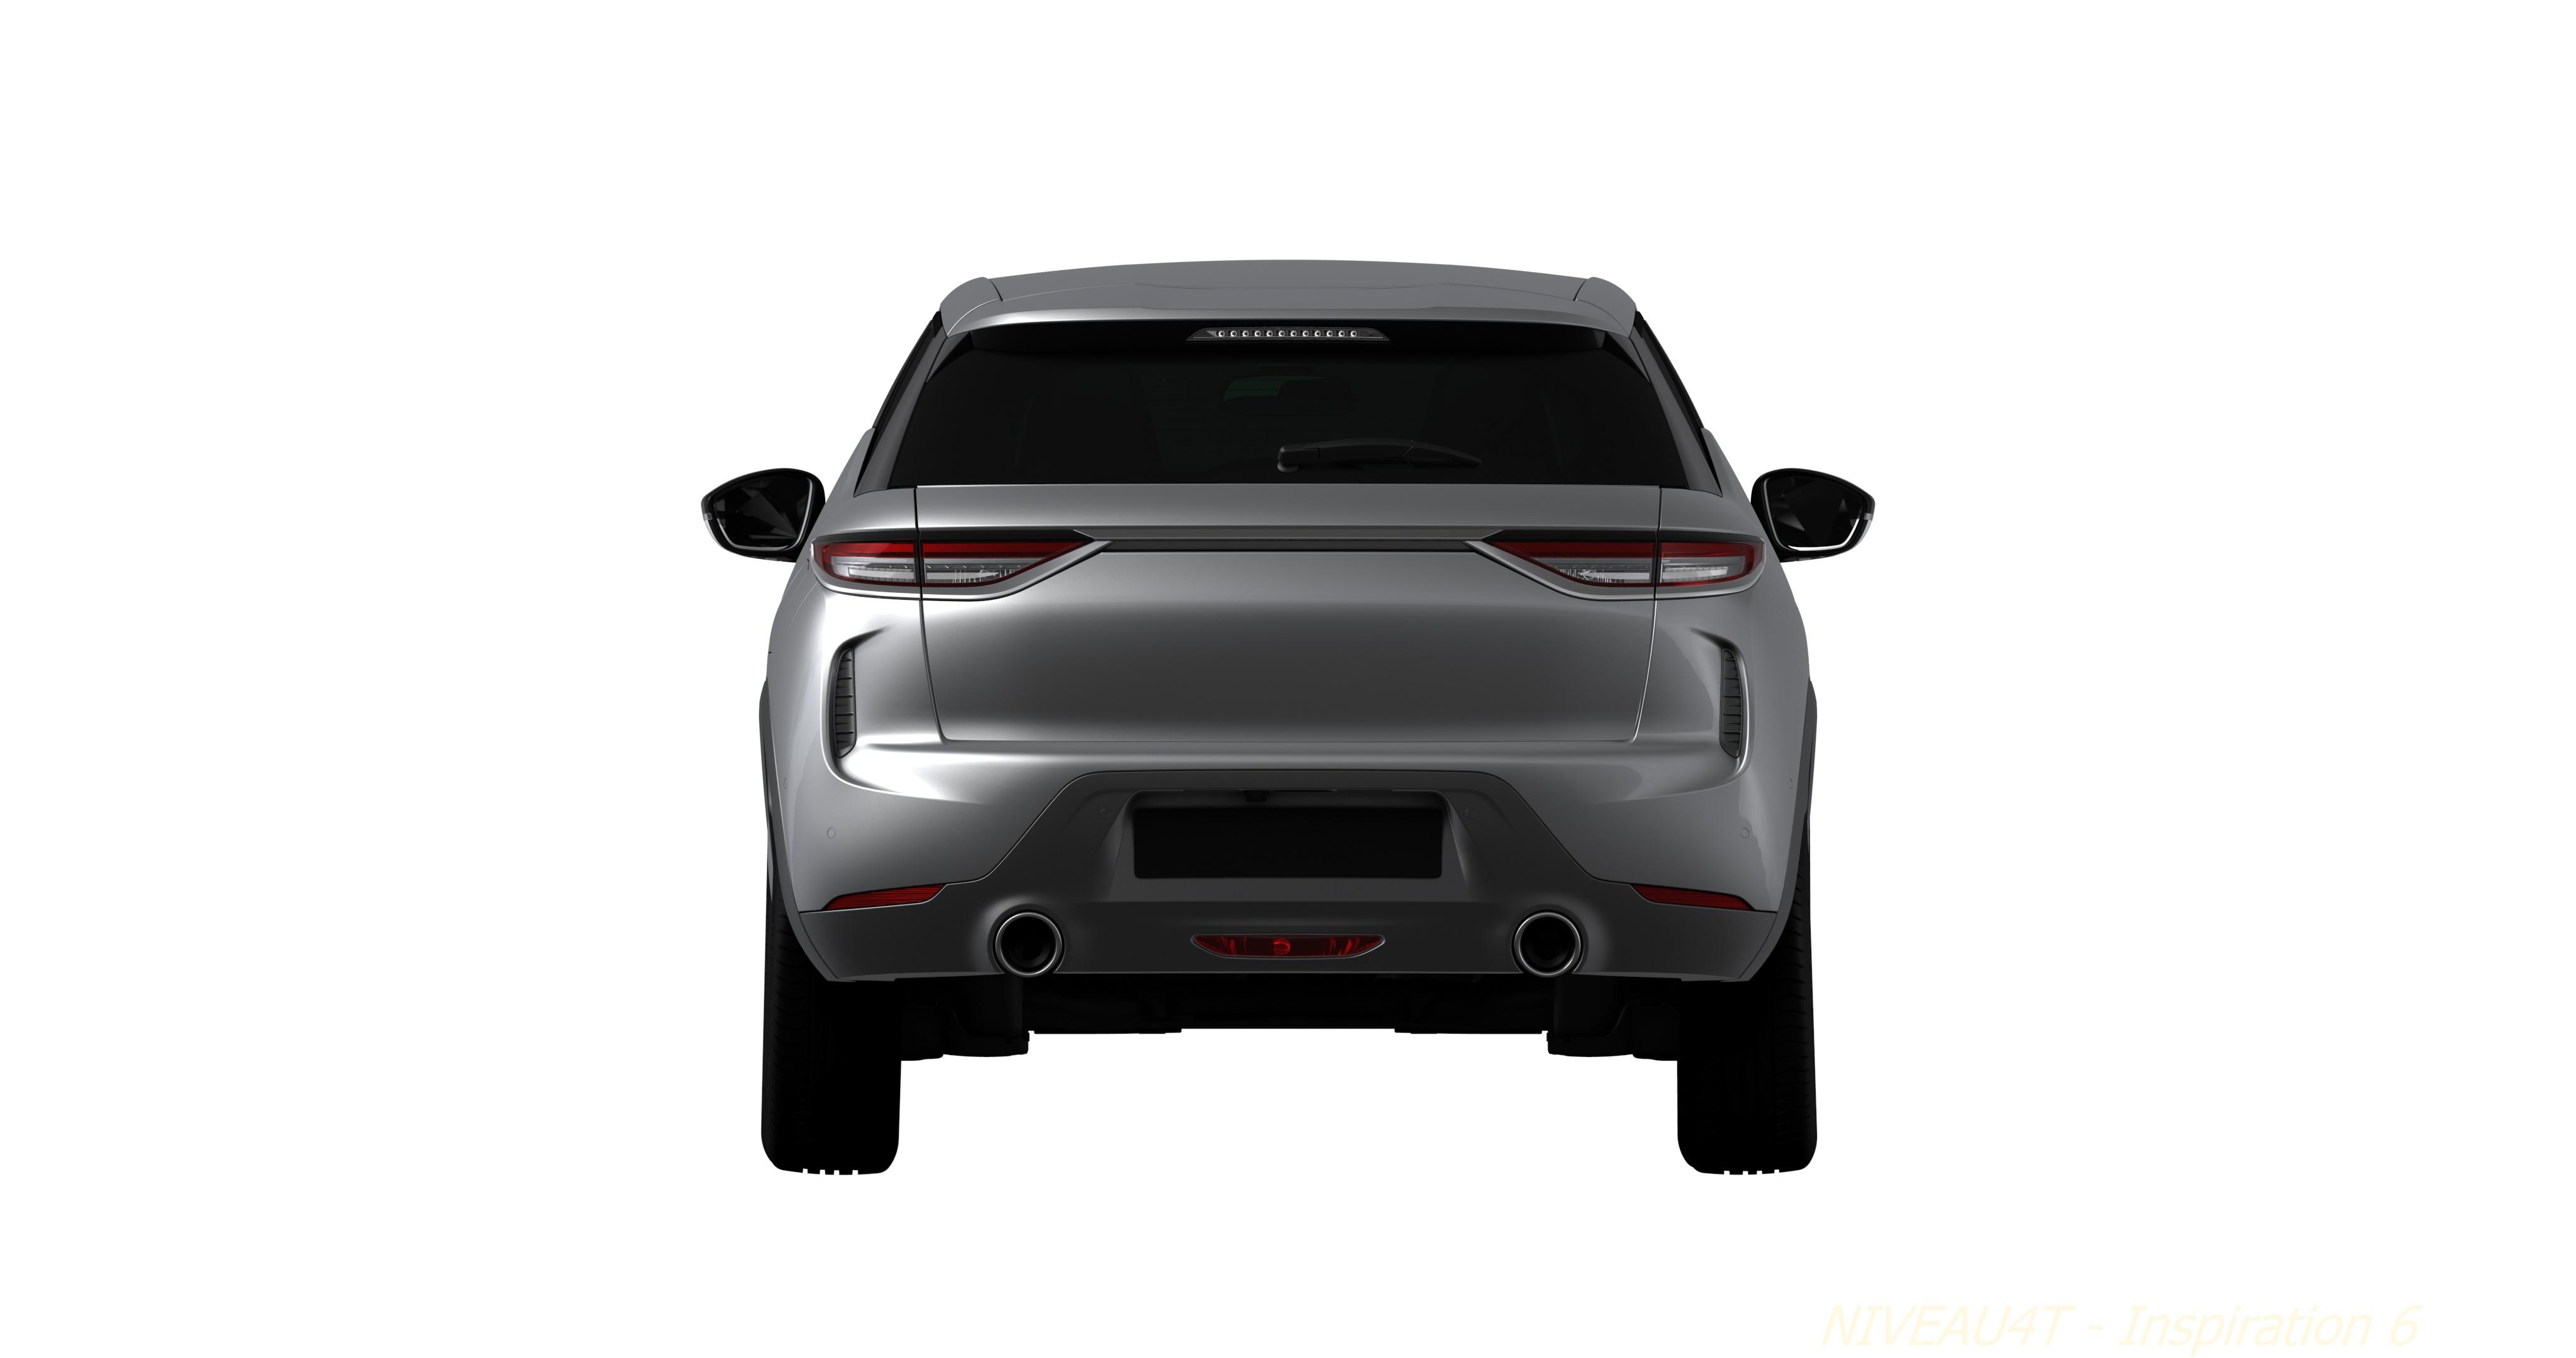 2018 - [DS Automobiles] DS 3 Crossback (D34) - Page 6 M674DBIVNK56FON27UQIXB6ZFHB2EEXSVQXXAFU6DU7HVJ25EXZS3TEOHRHGA3KBP7UC3HZ7K3JZ4